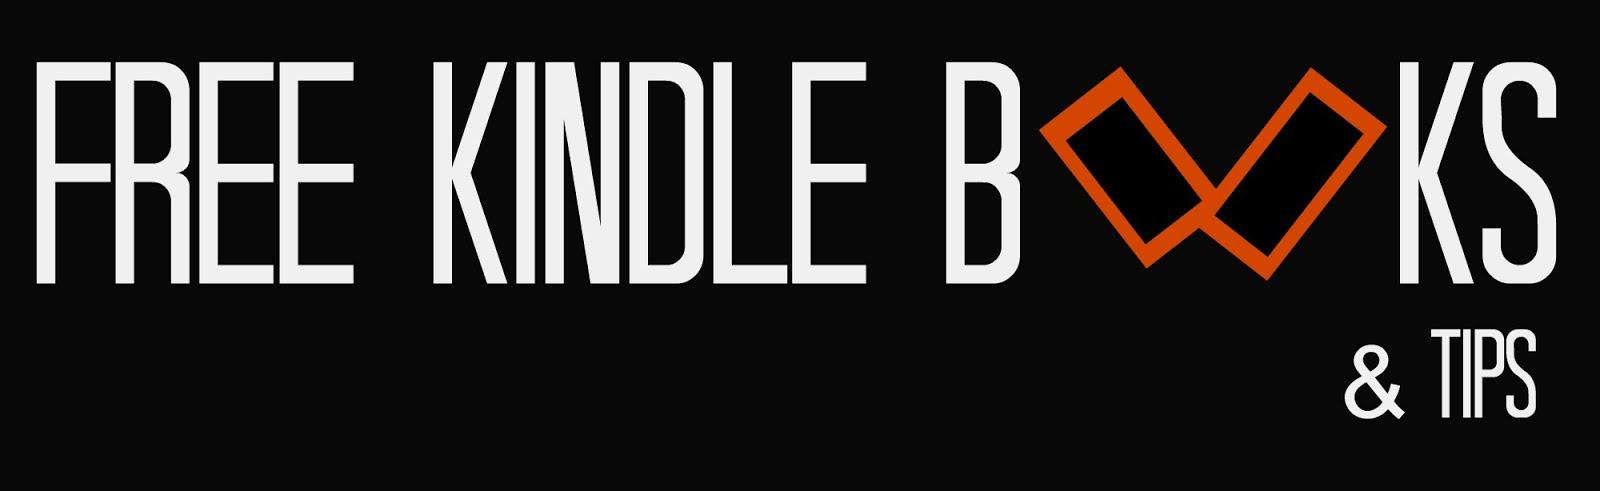 Free Kindle Books & Tips